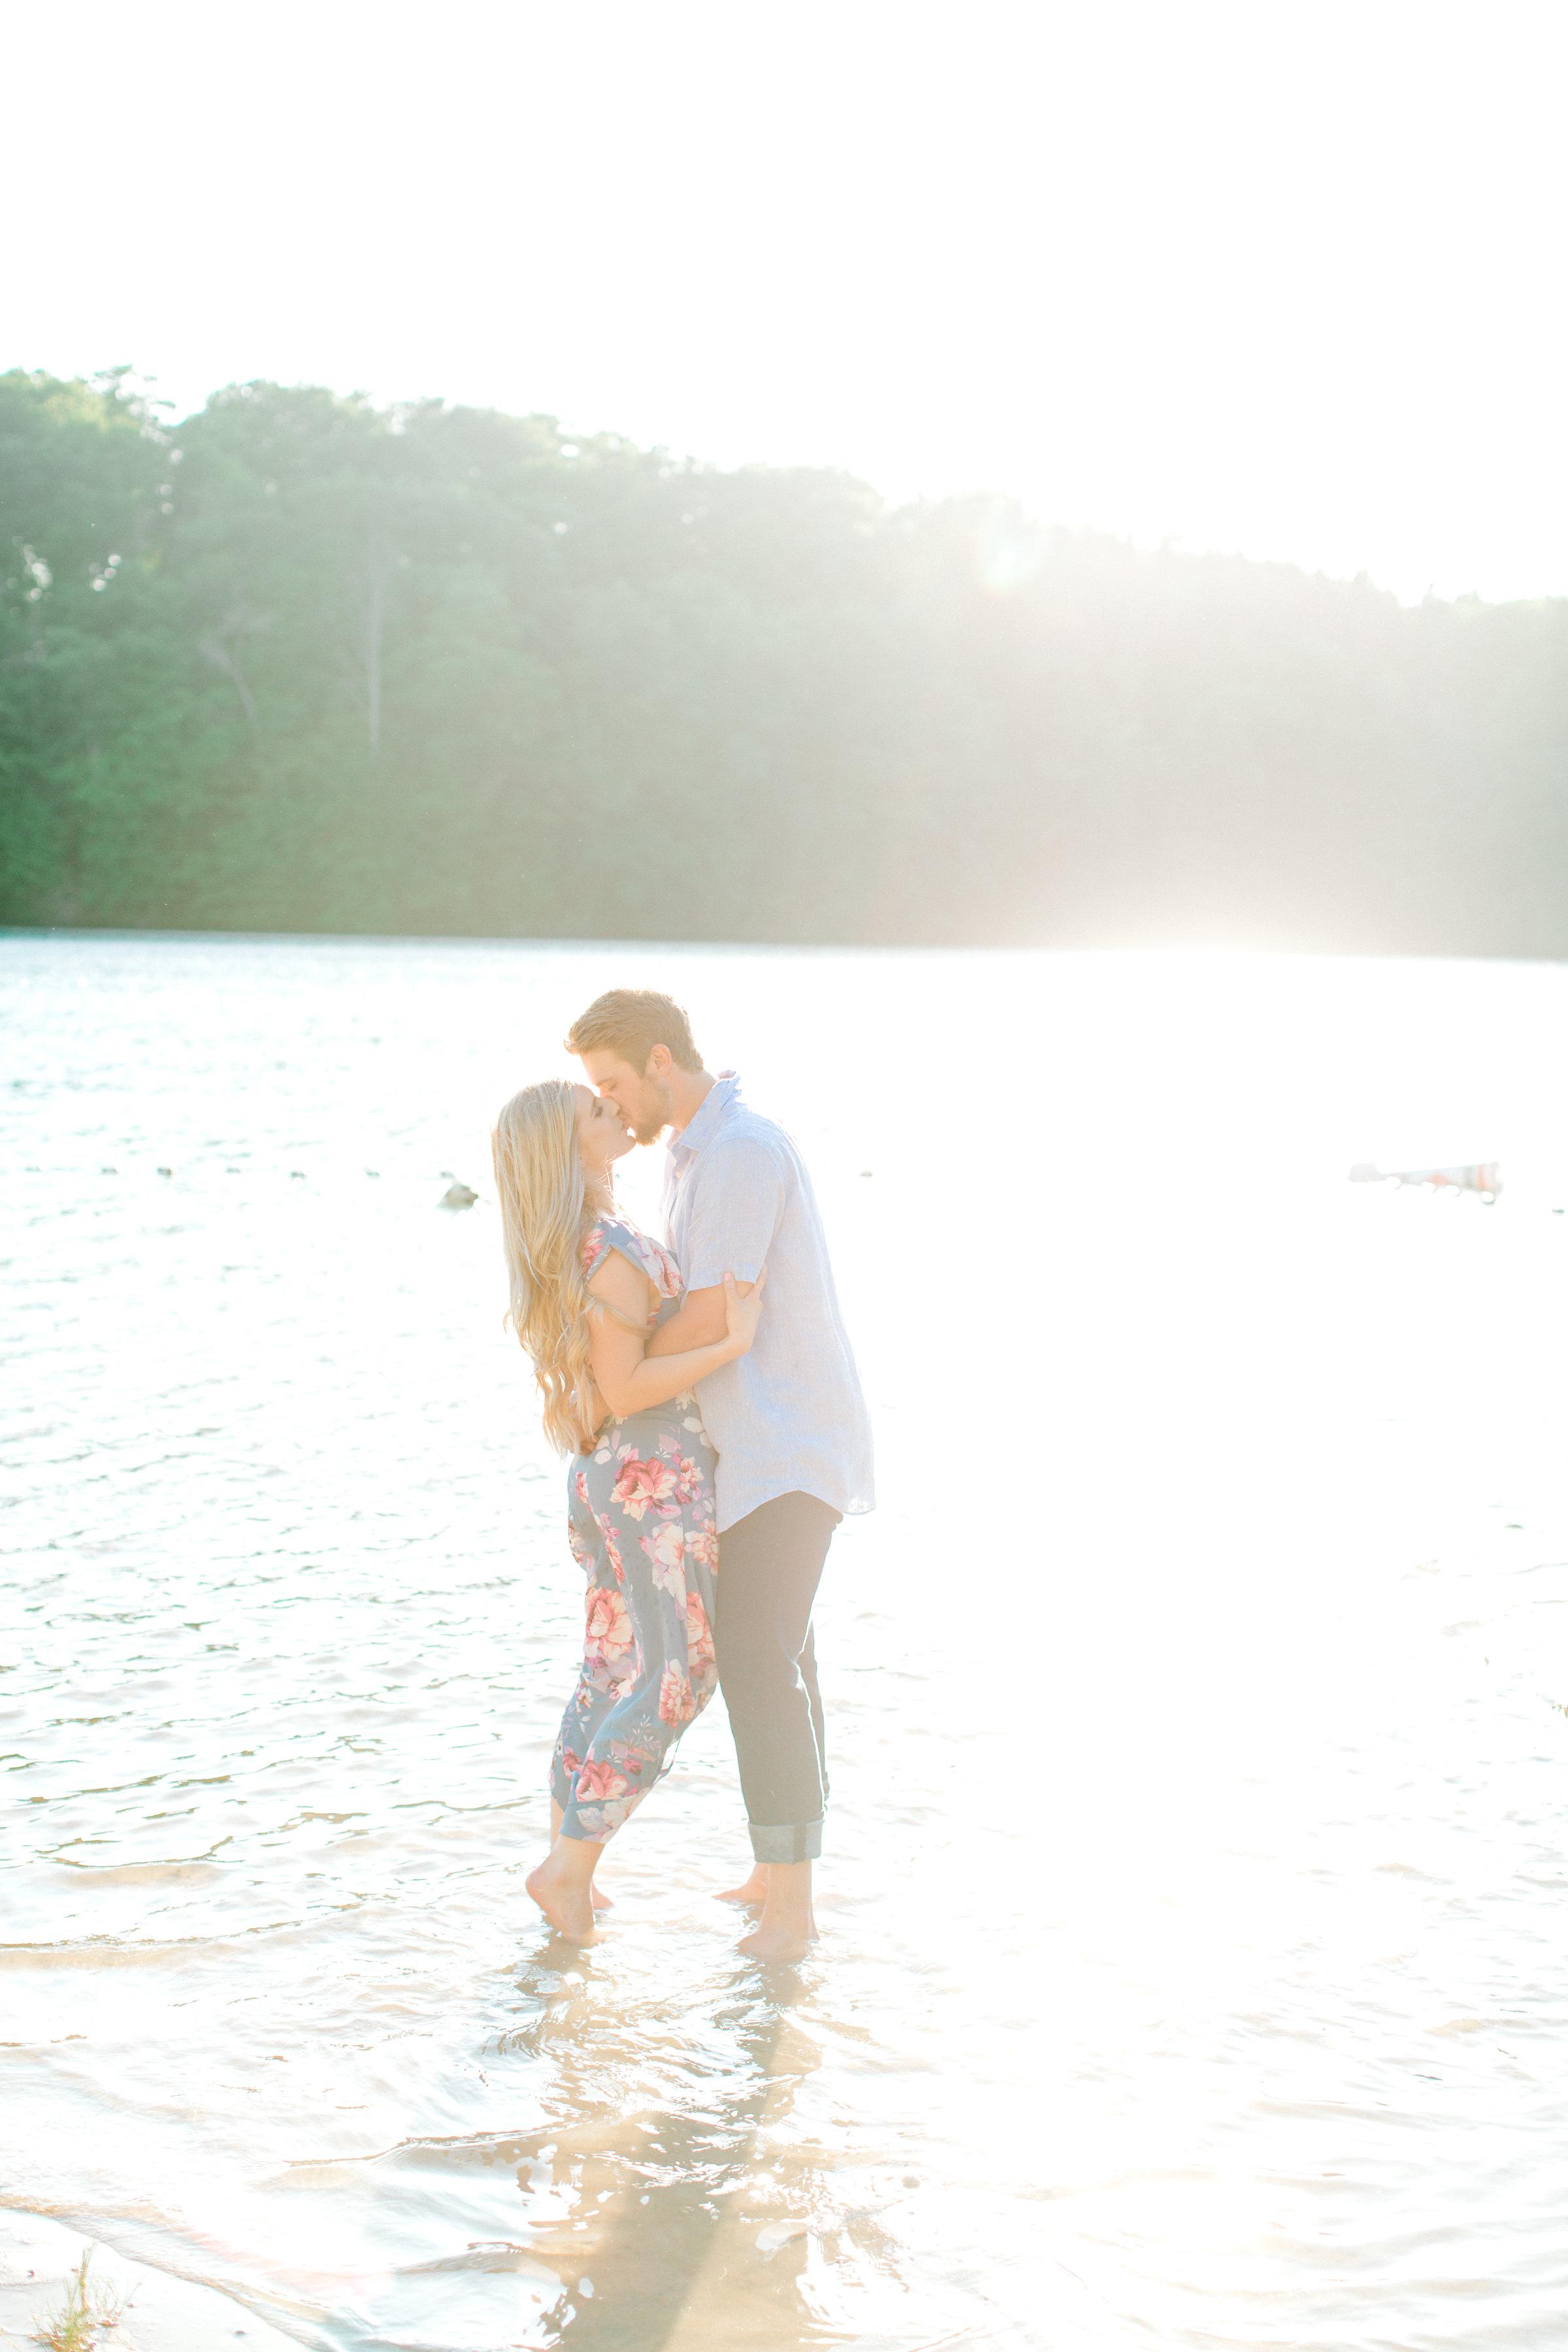 Hannah+Kyle+Engaged-64.jpg